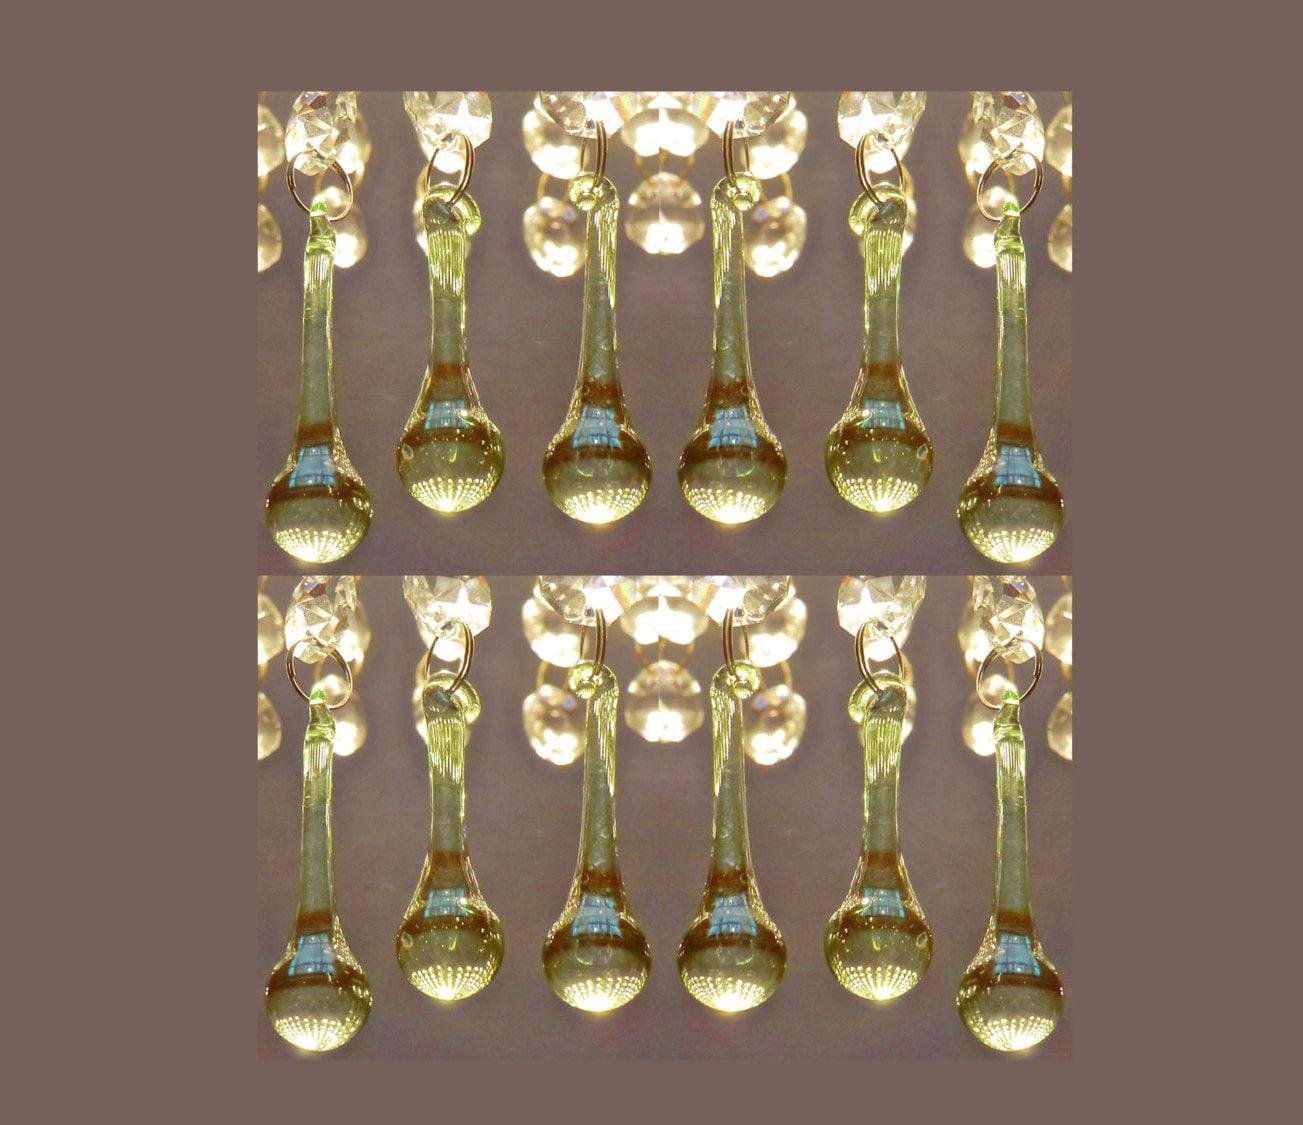 Chandelier Crystals Bulk